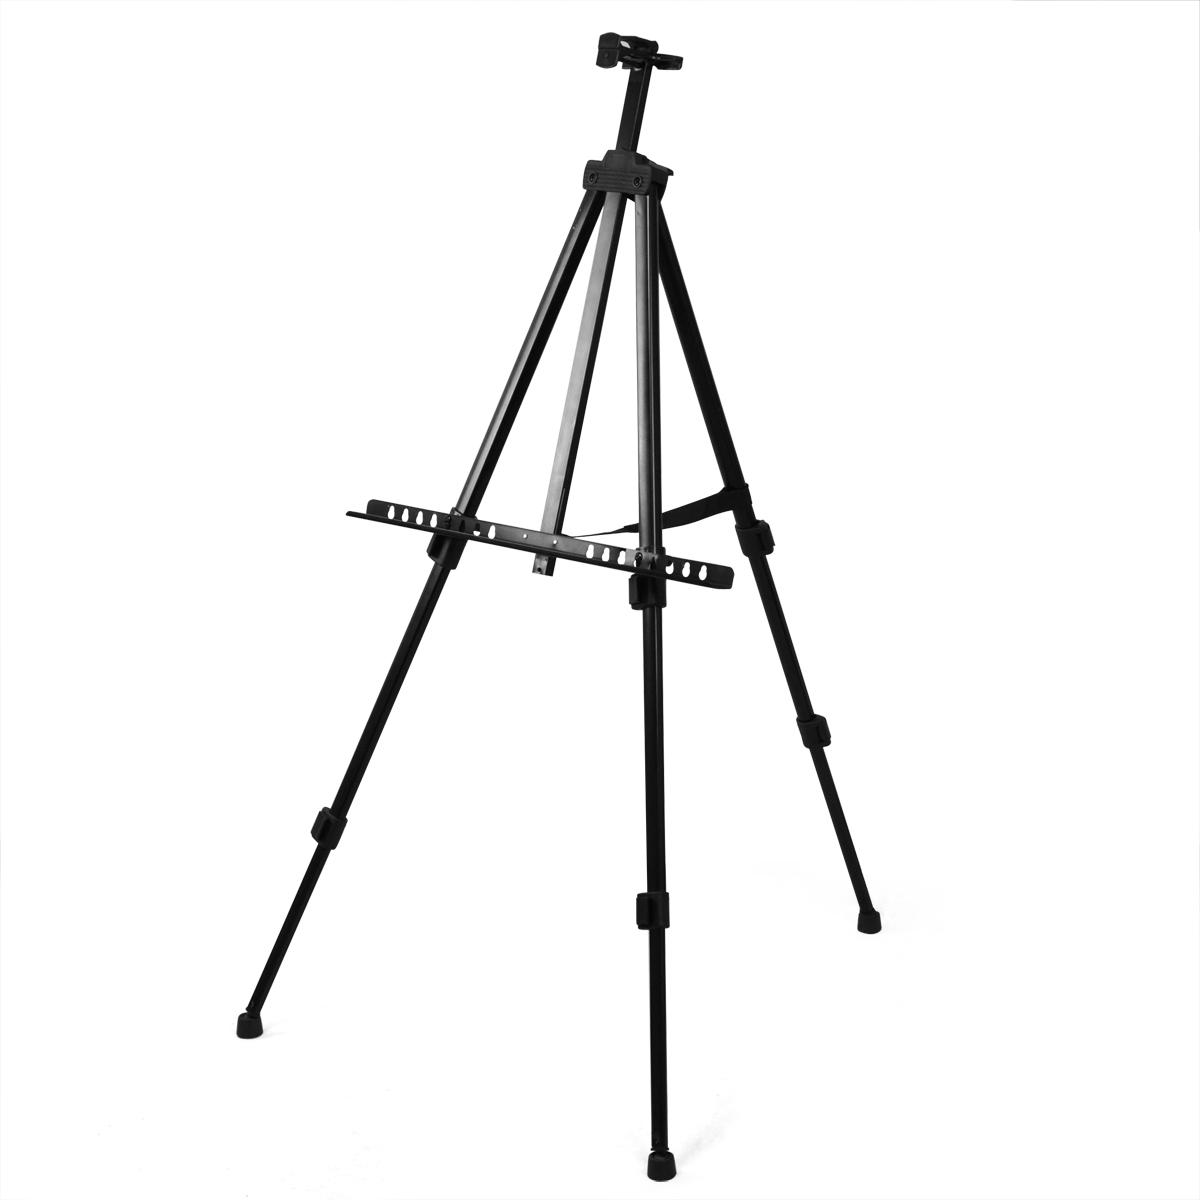 weiss brett kuenstler teleskopfeld studio malerei staffelei stativ